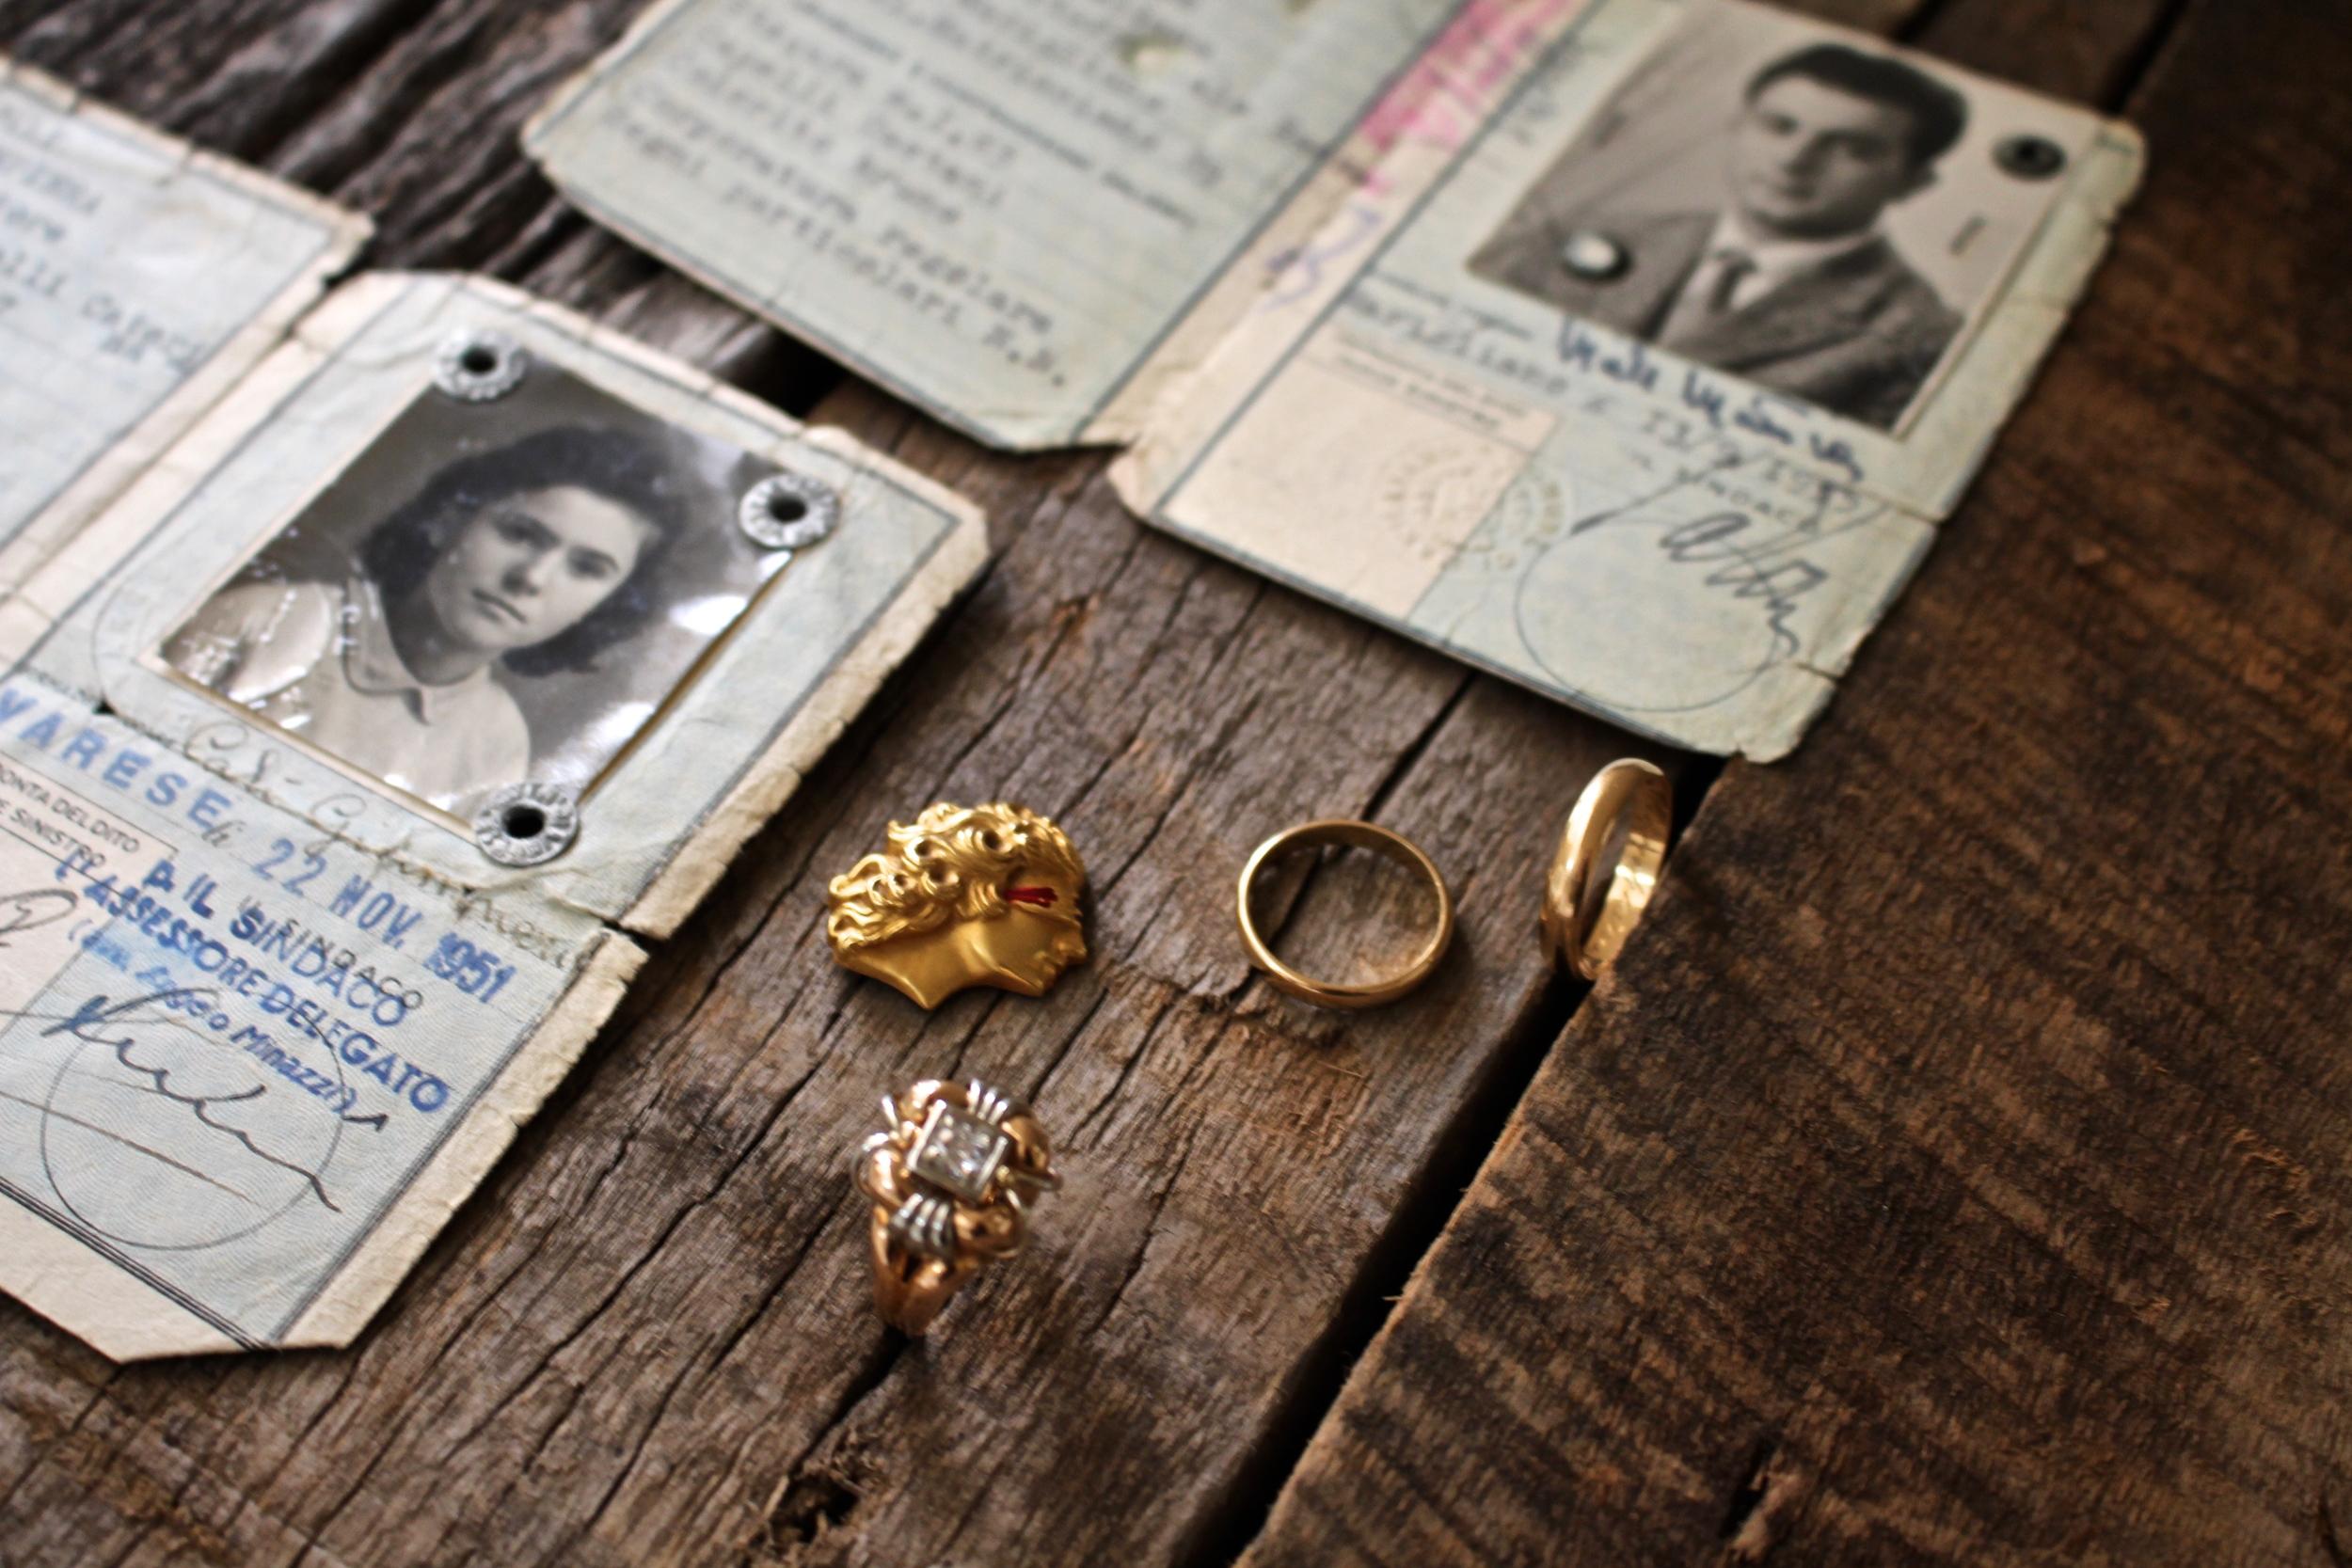 Her grandparents' passports